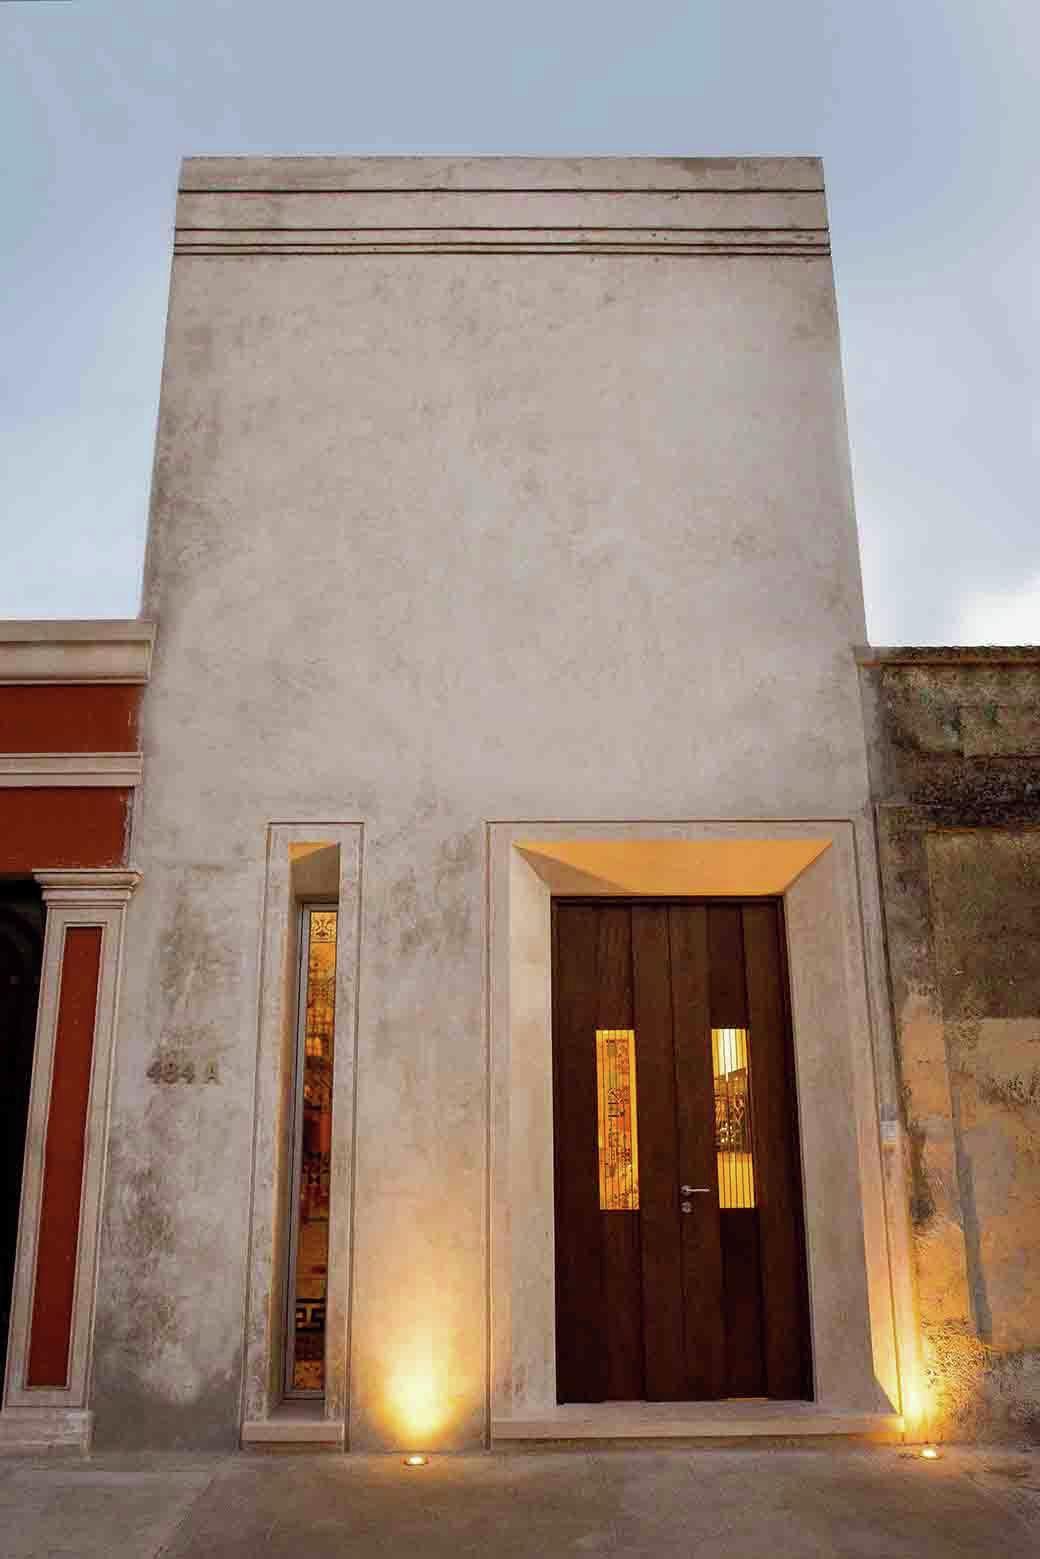 Gallery of b h 45 h ponce arquitectos 2 - Fachadas exteriores de casas ...